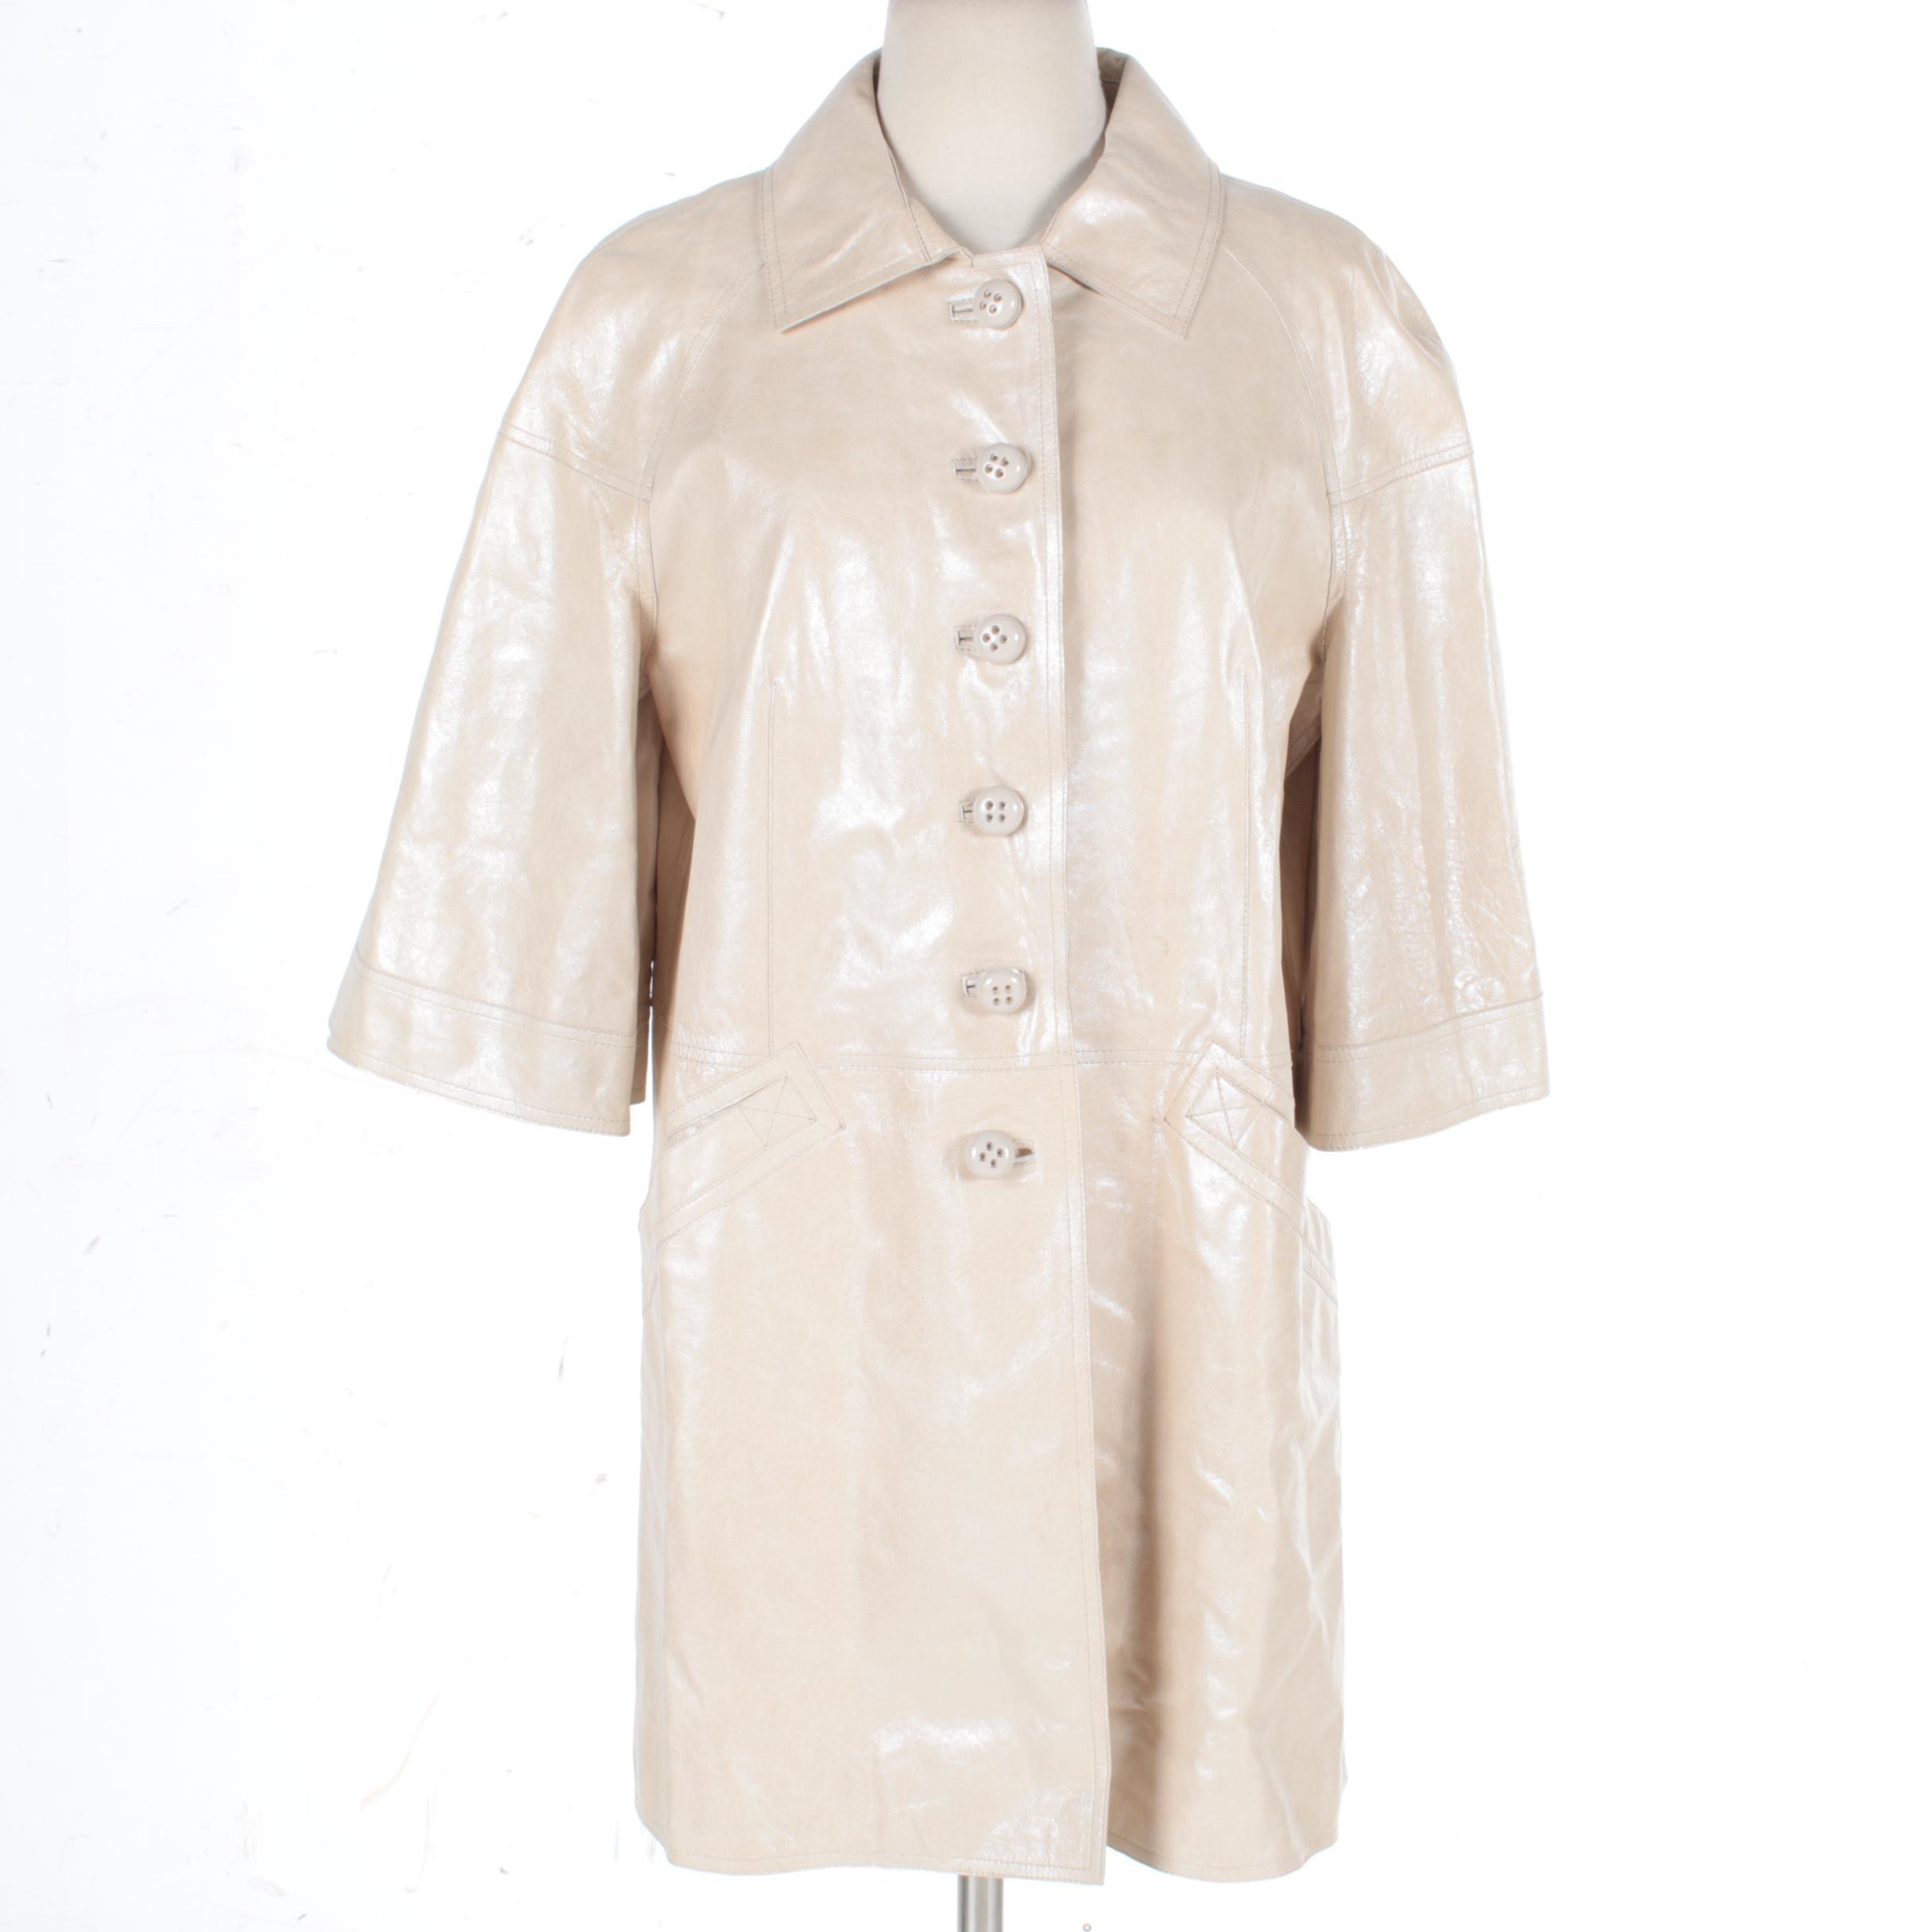 Women's Per Se Cream Leather Jacket